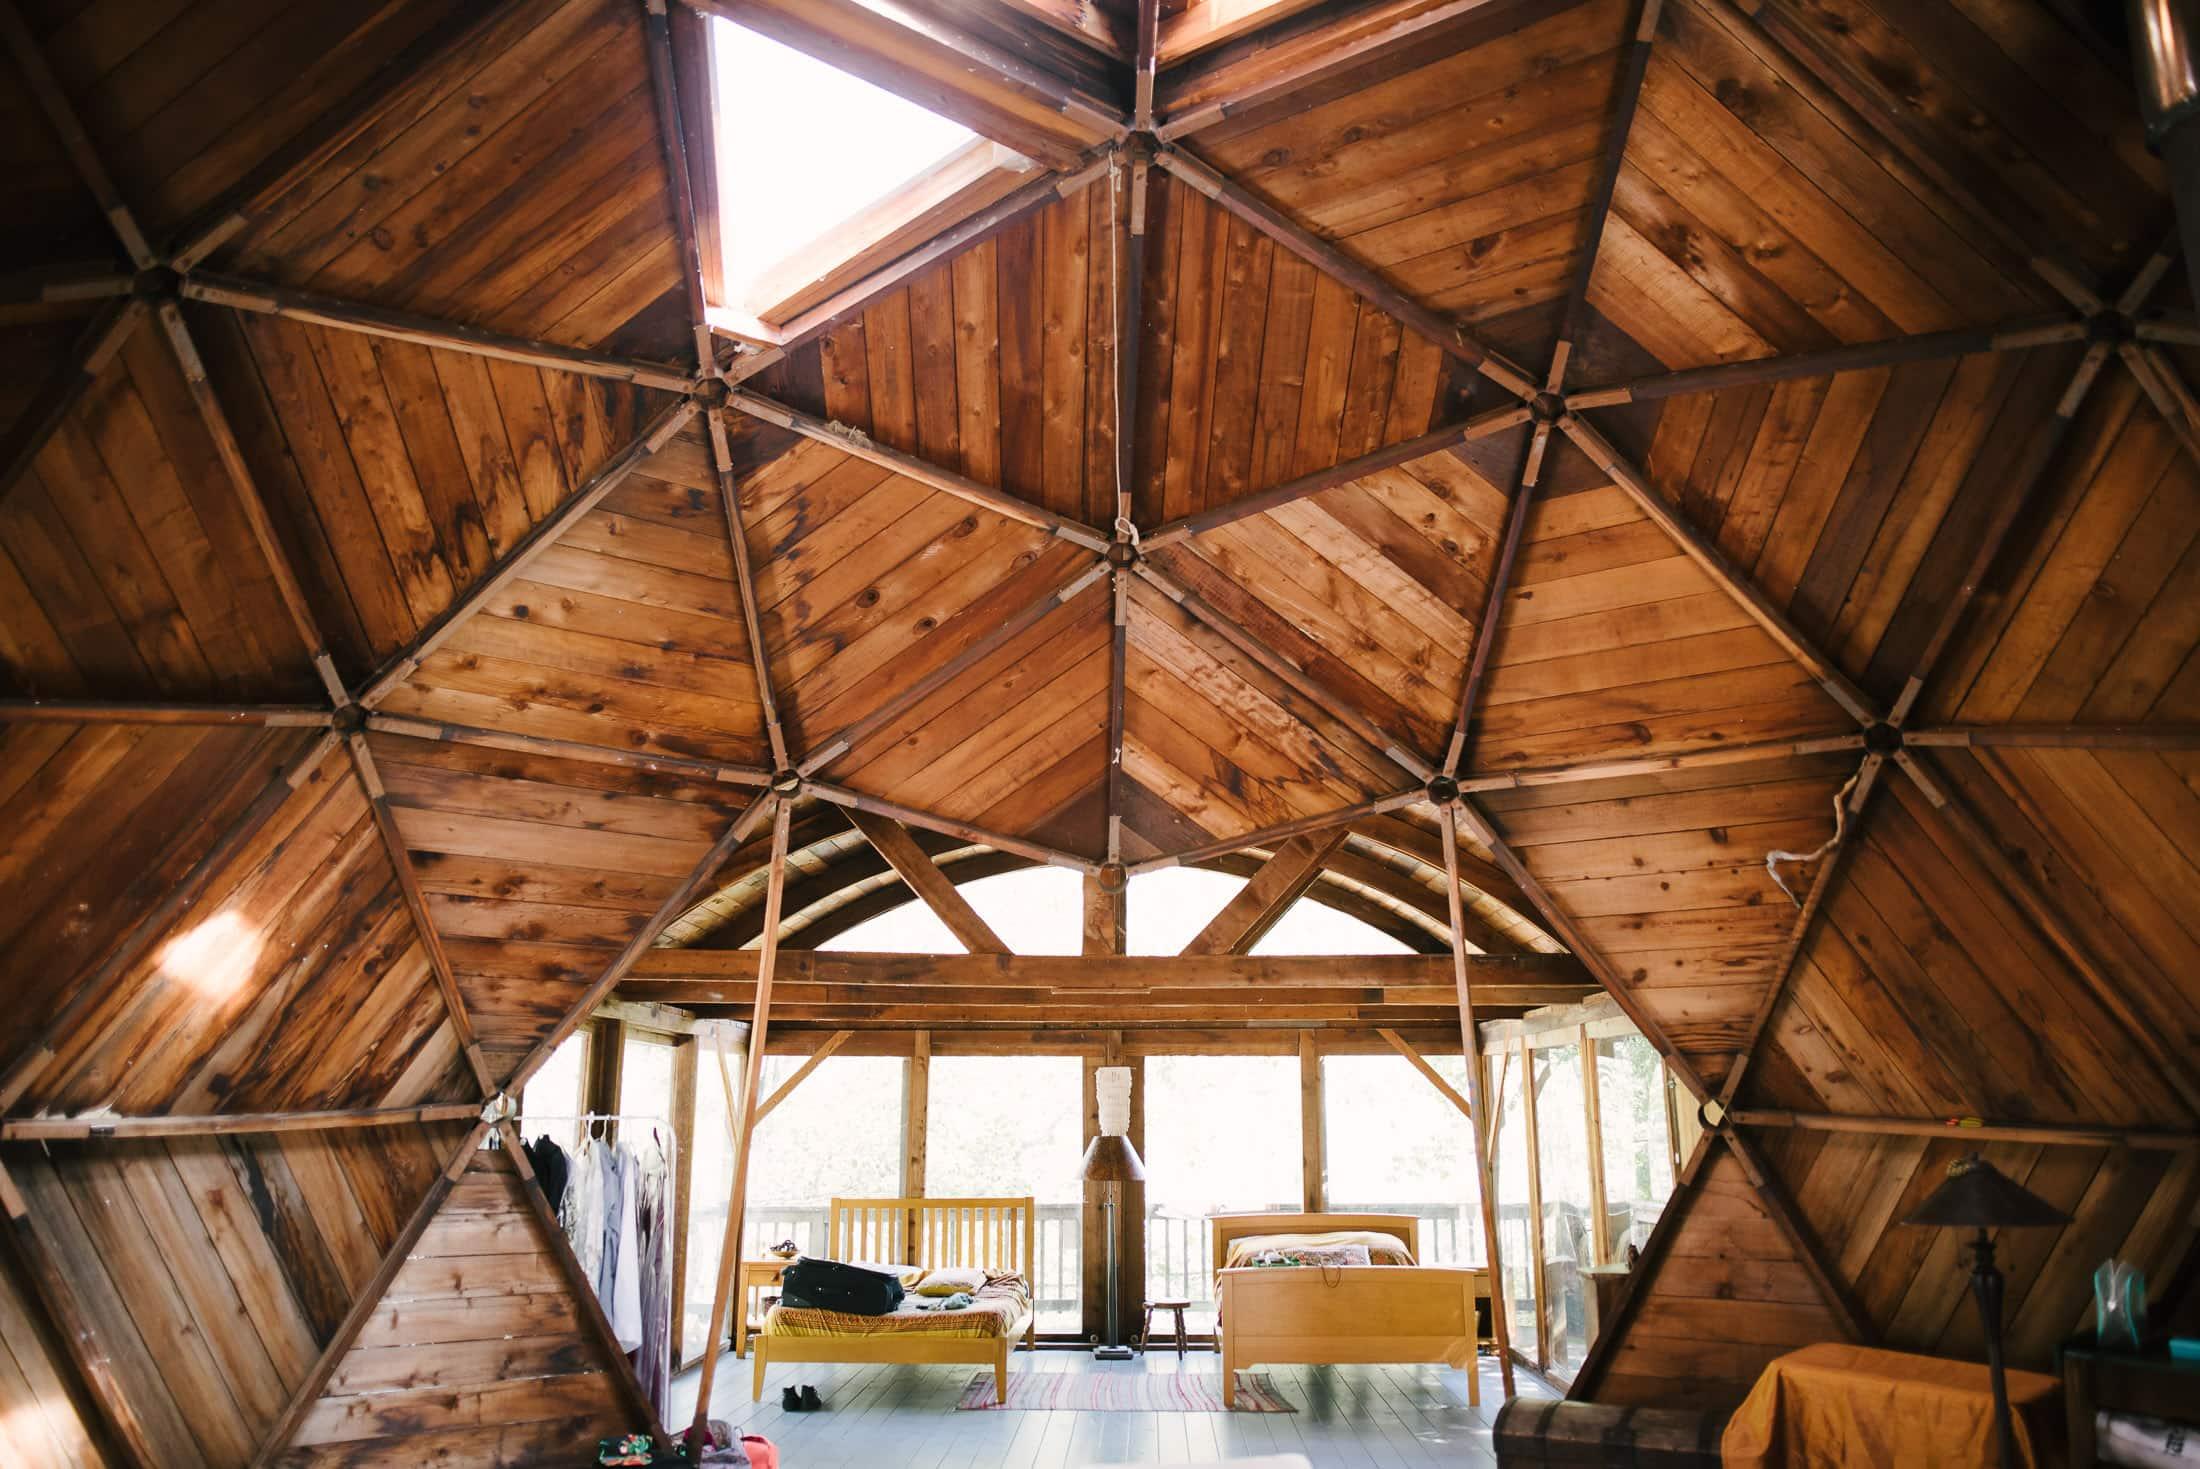 Oz Farm Domes inside